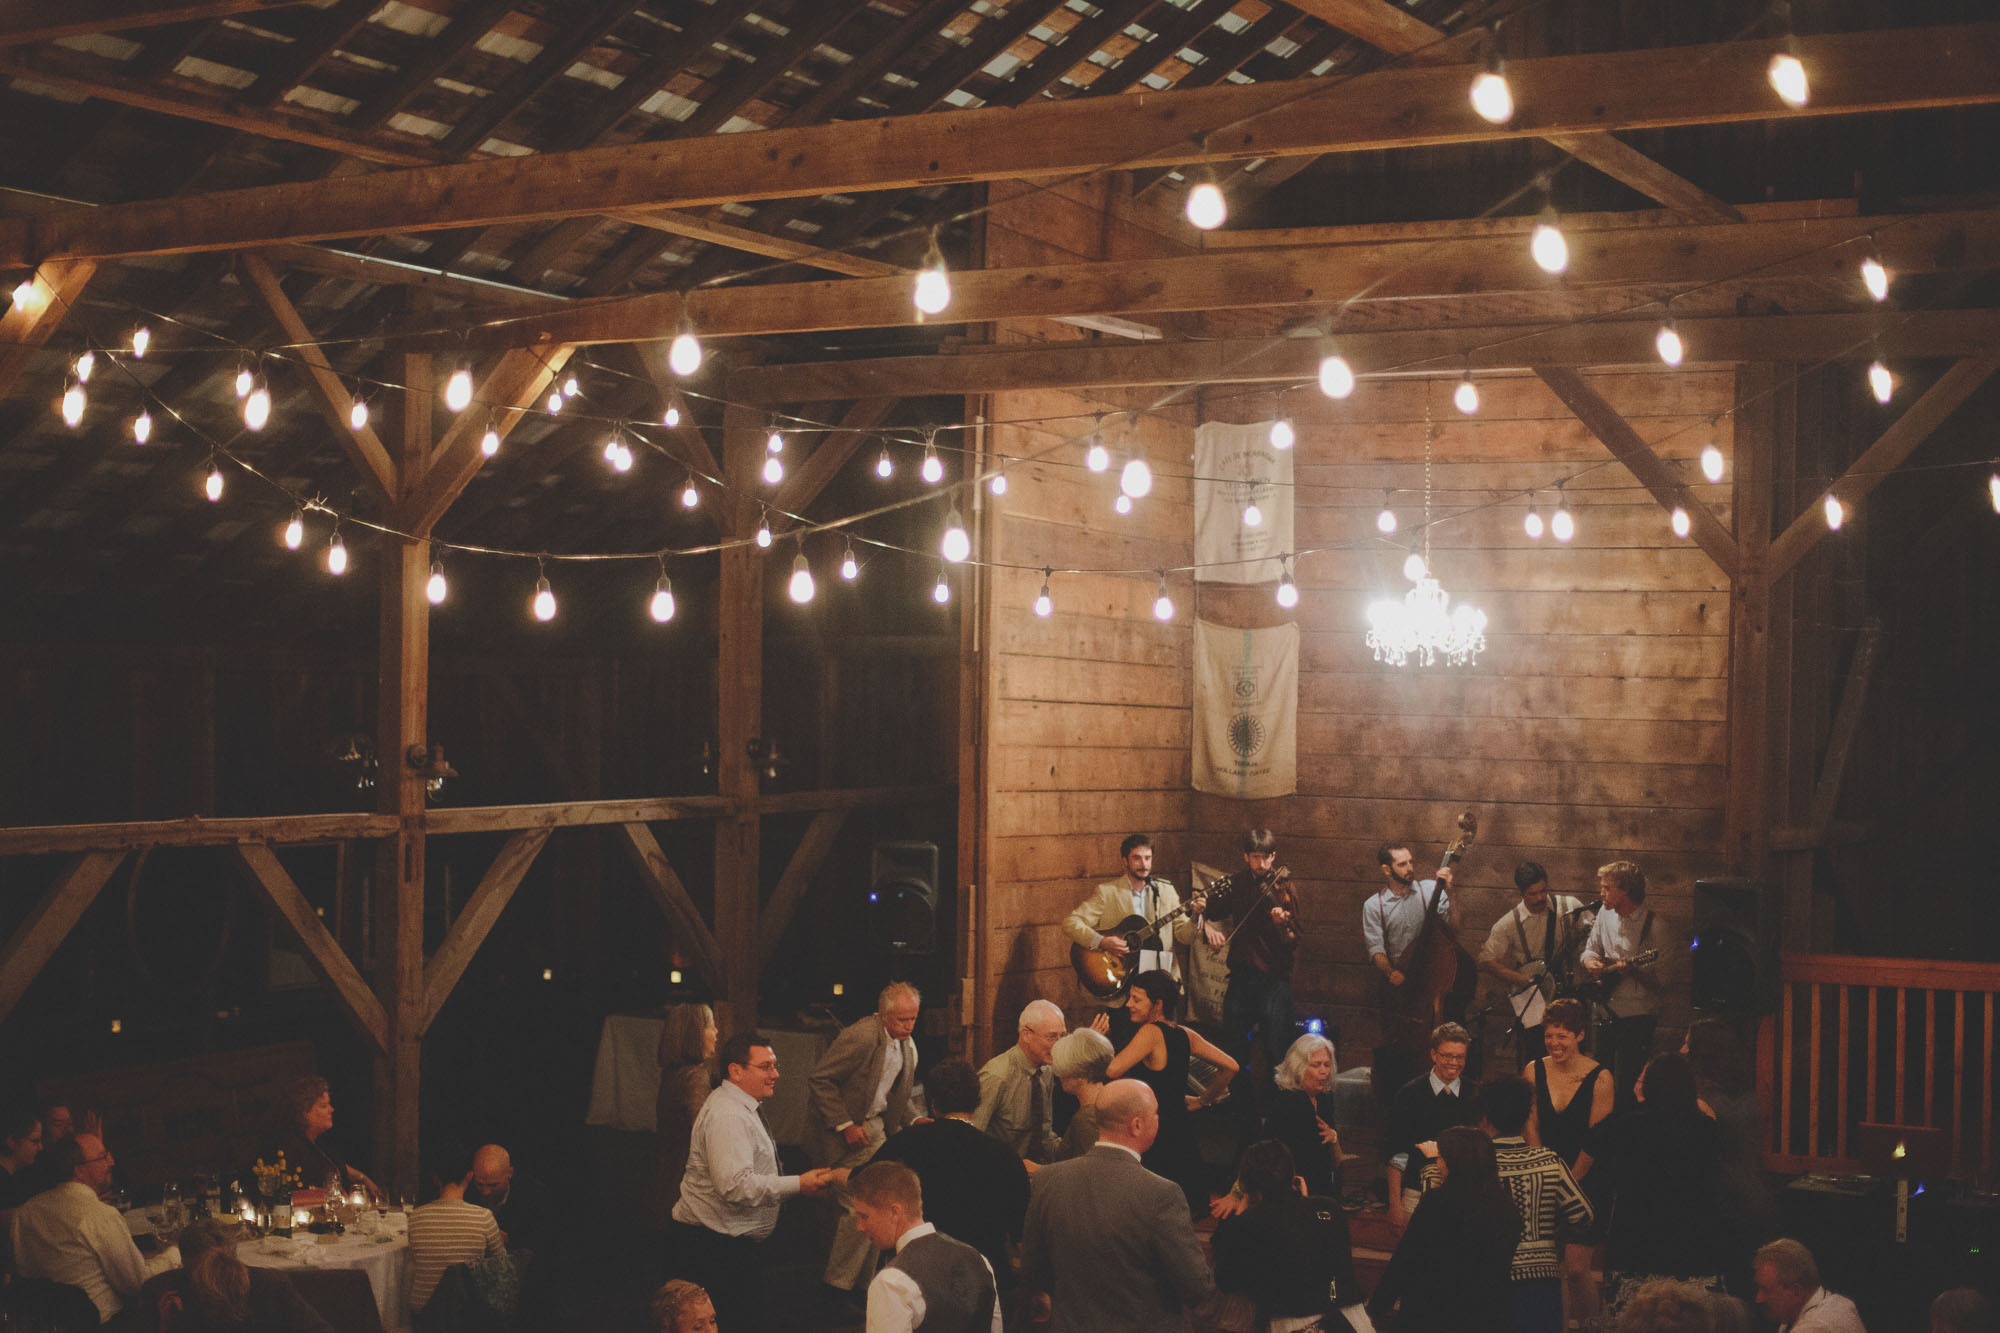 Gretchen_Gause_Petaluma_Olympias_Valley_Wedding_Photo-255.jpg